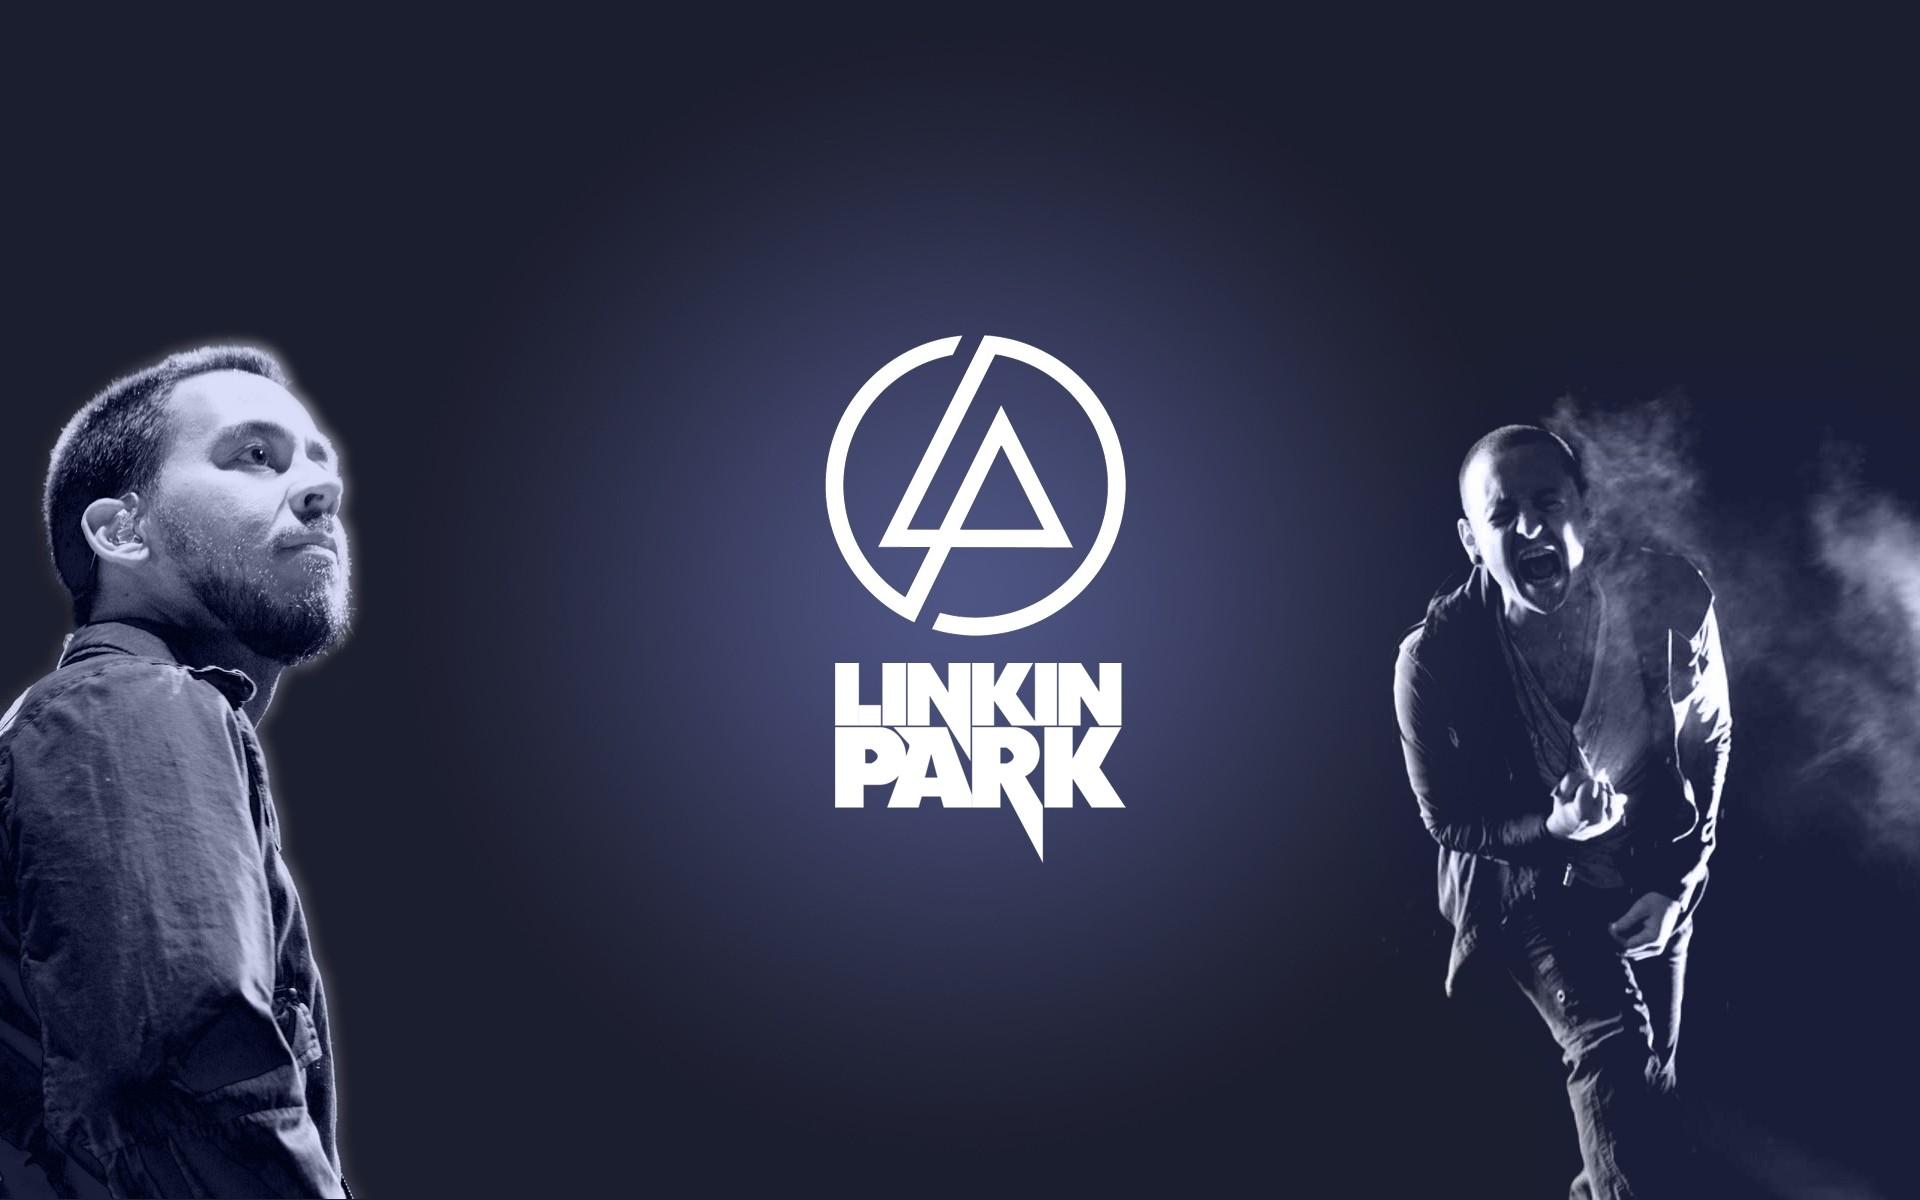 Linkin Park Wallpaper 1920x1200 Linkin Park 1920x1200